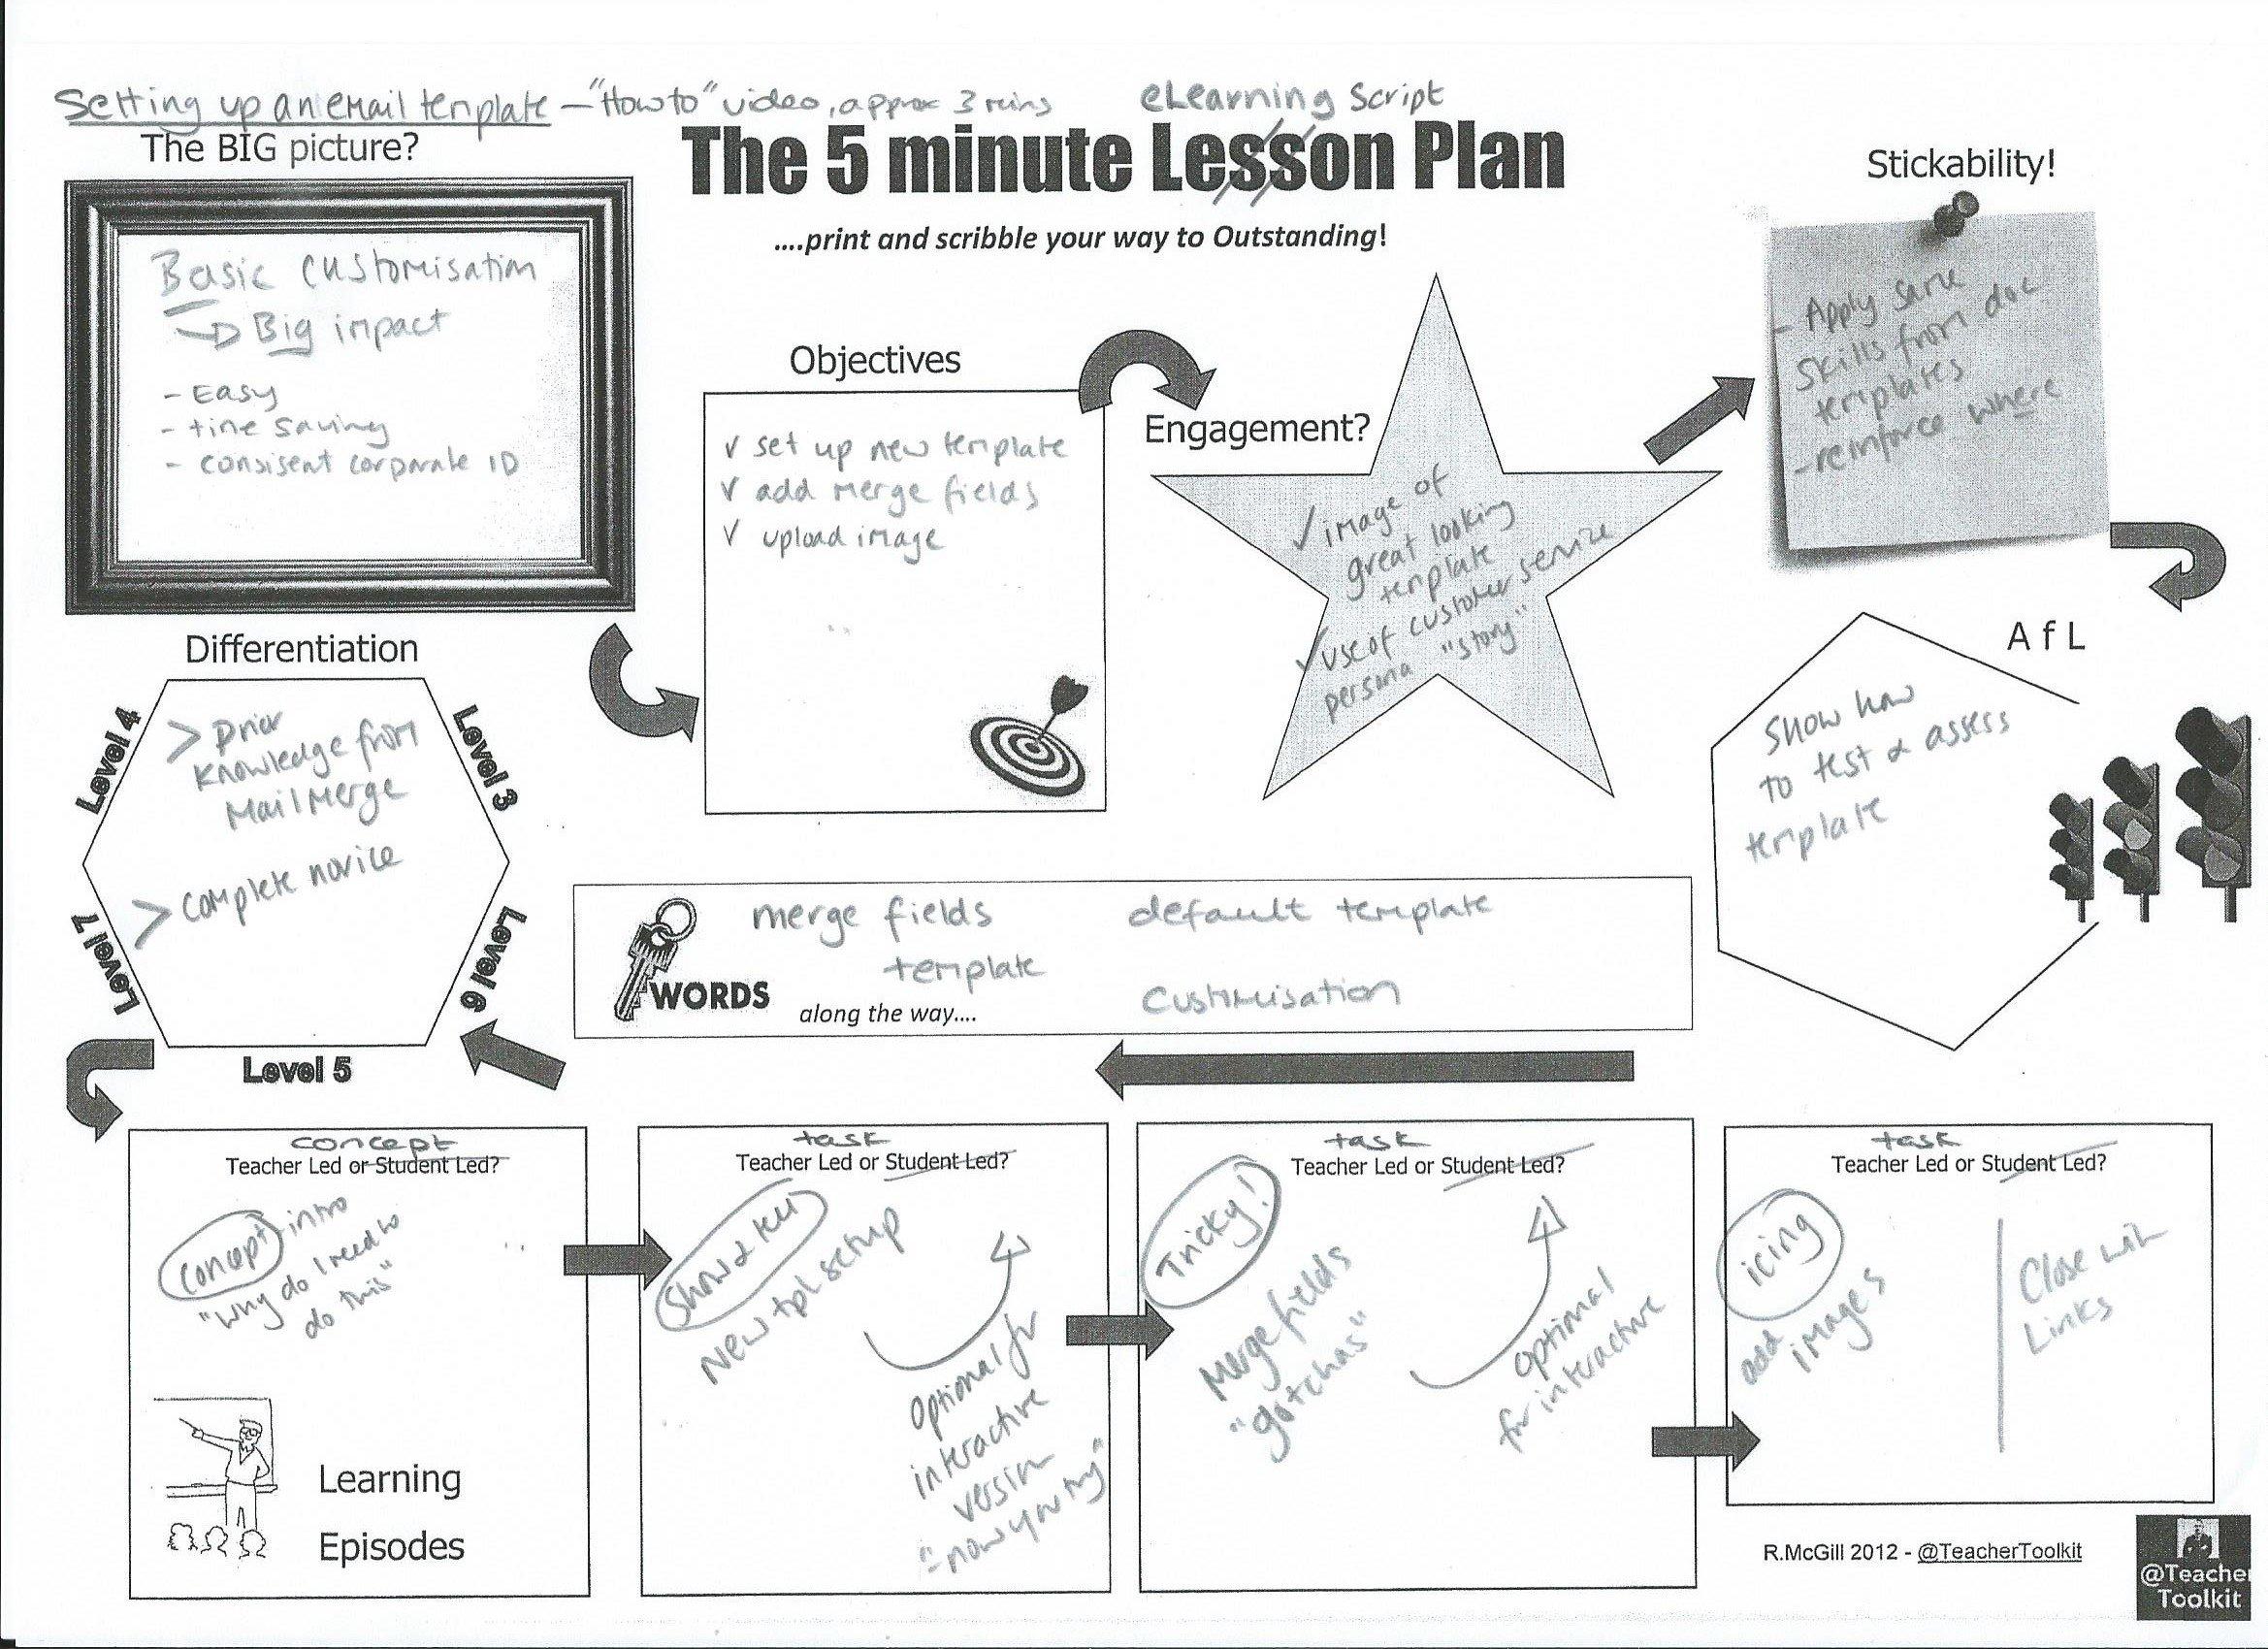 10 Unique 5 Minute Lesson Plan Ideas the 5 minute elearning script planner roman9 2020